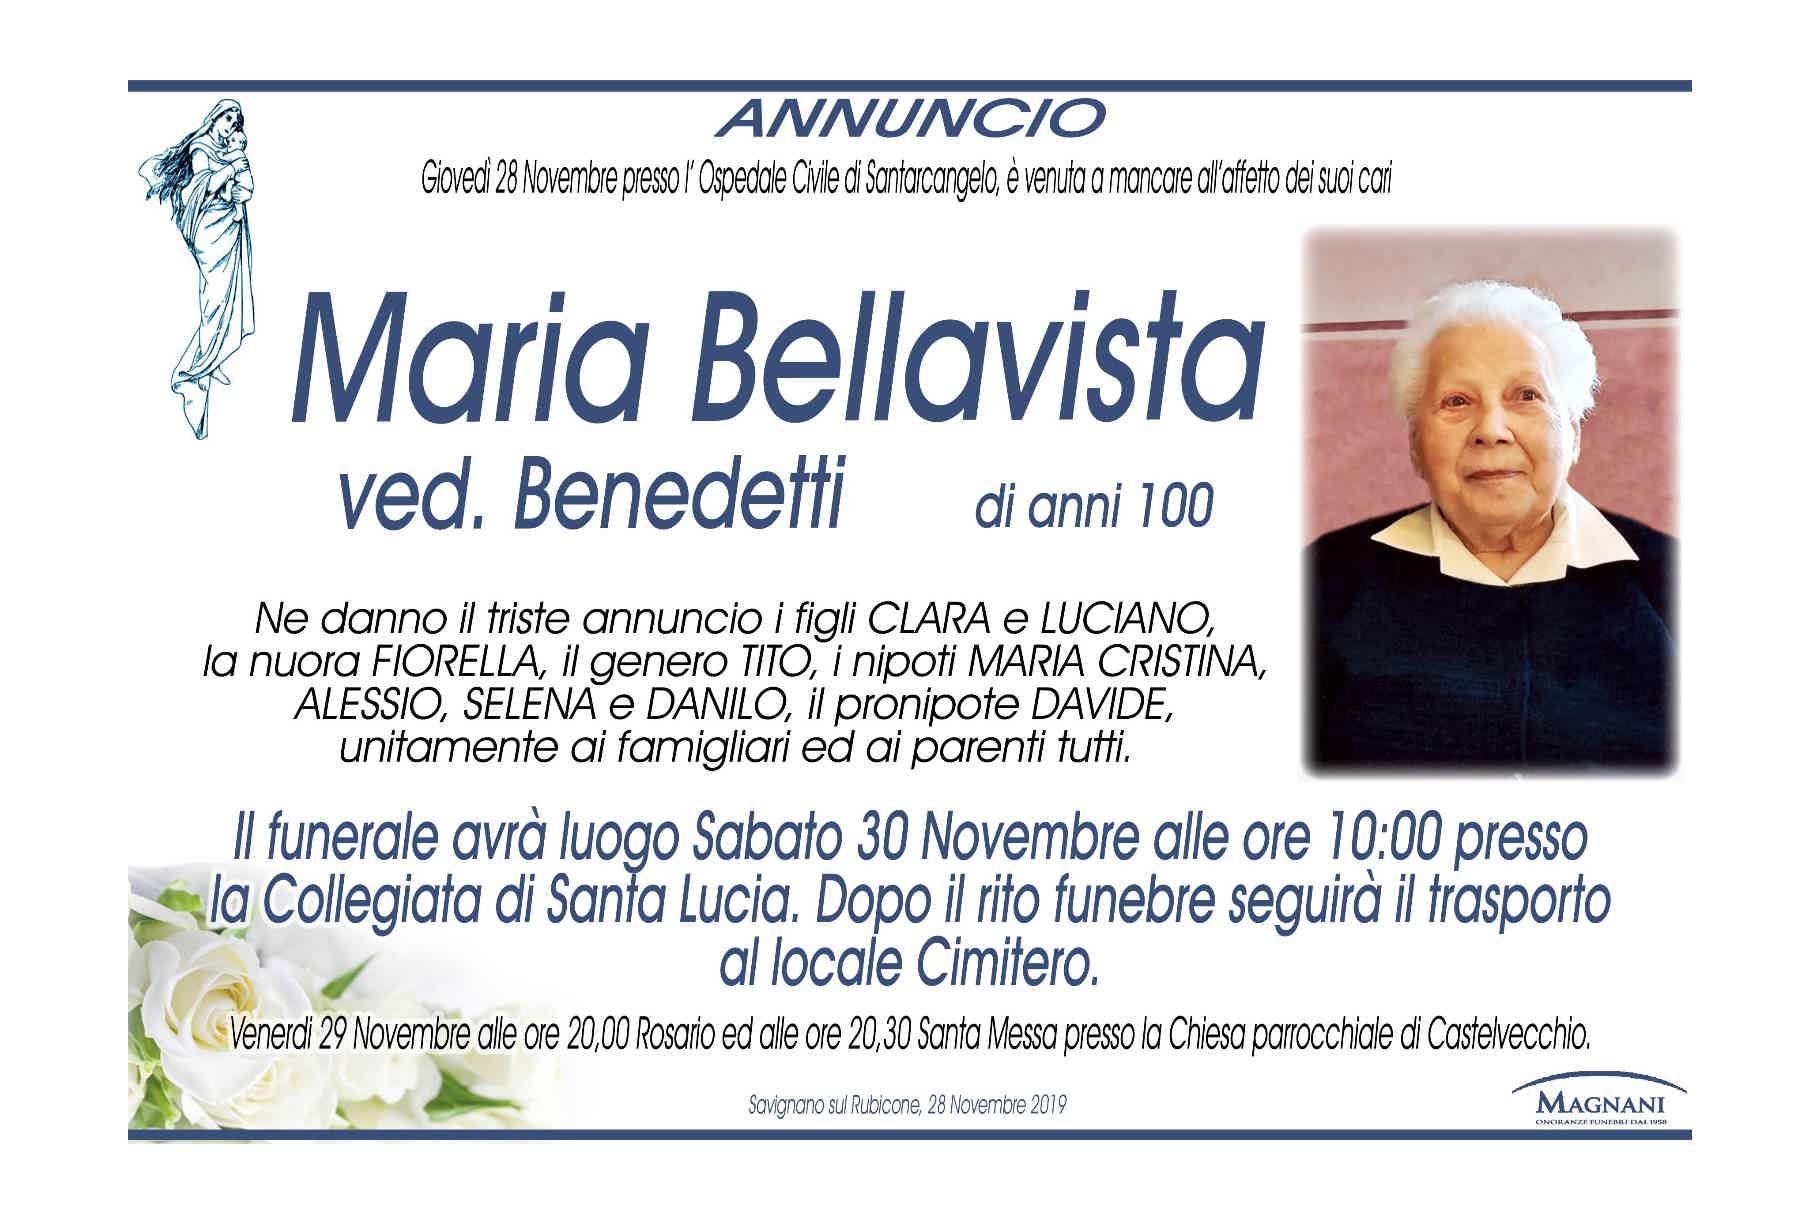 Maria Bellavista